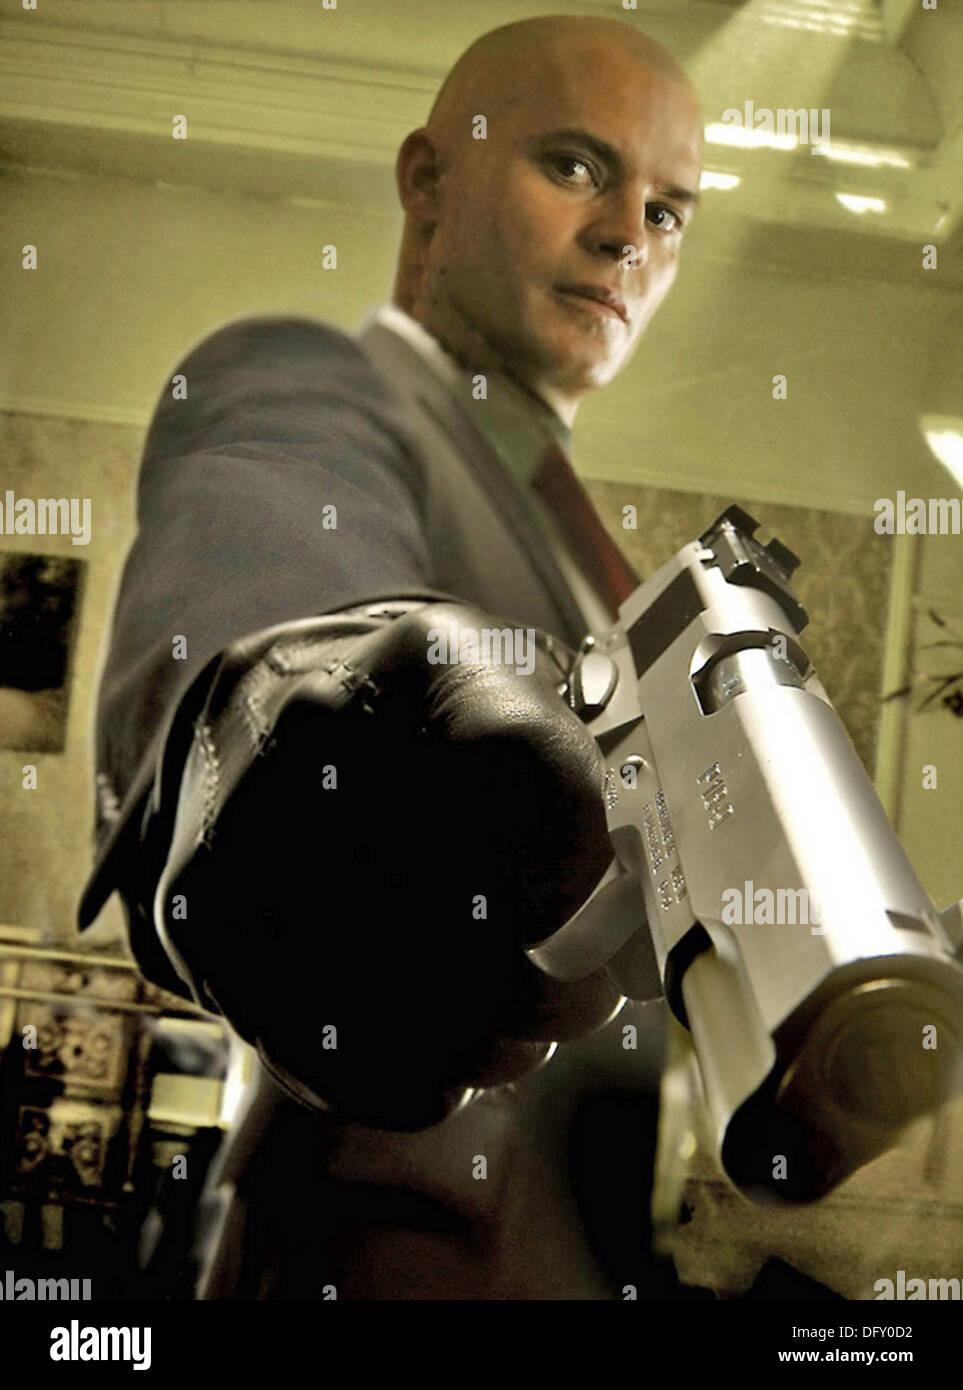 HITMAN   2007 Twentieth Century Fox film with Timothy Olyphant - Stock Image